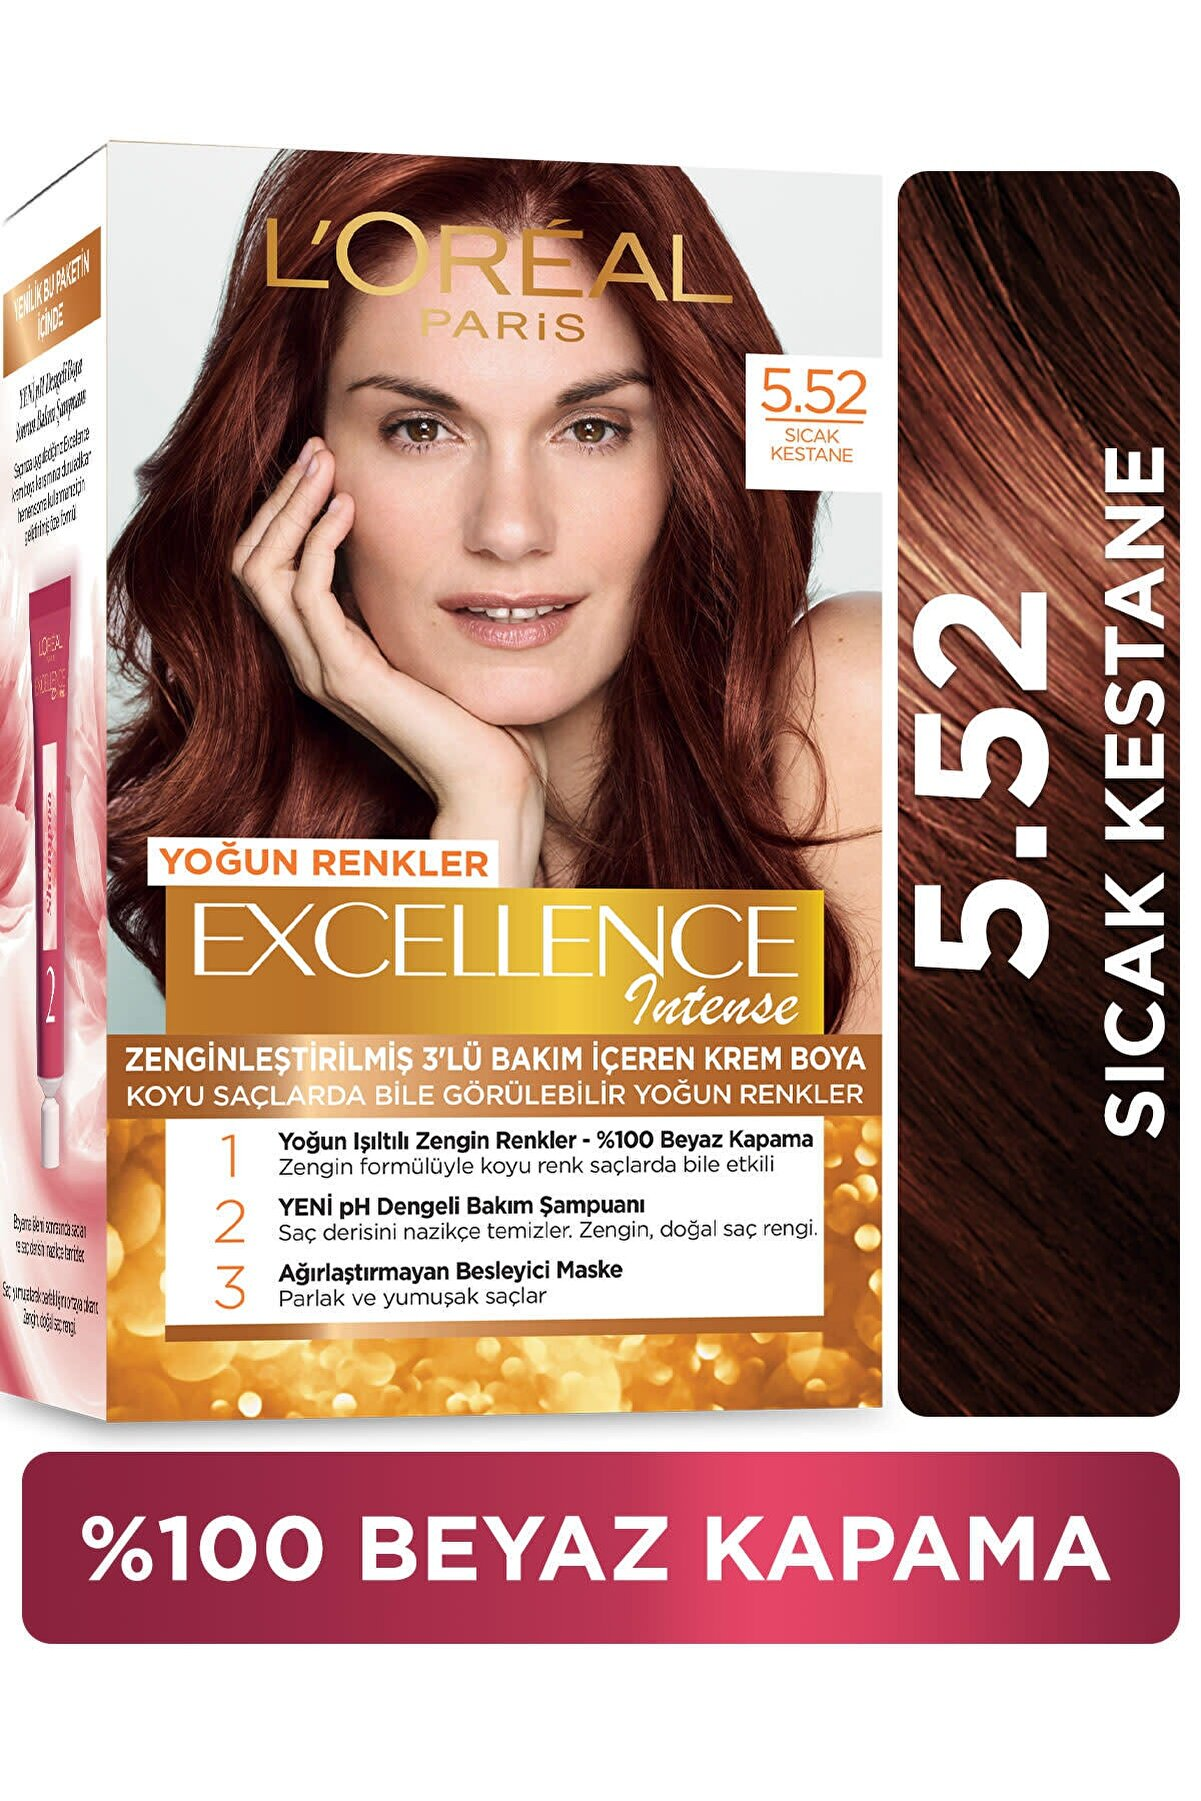 L'Oreal Paris Excellence Intense Saç Boyası 5.52 Sıcak Kestane